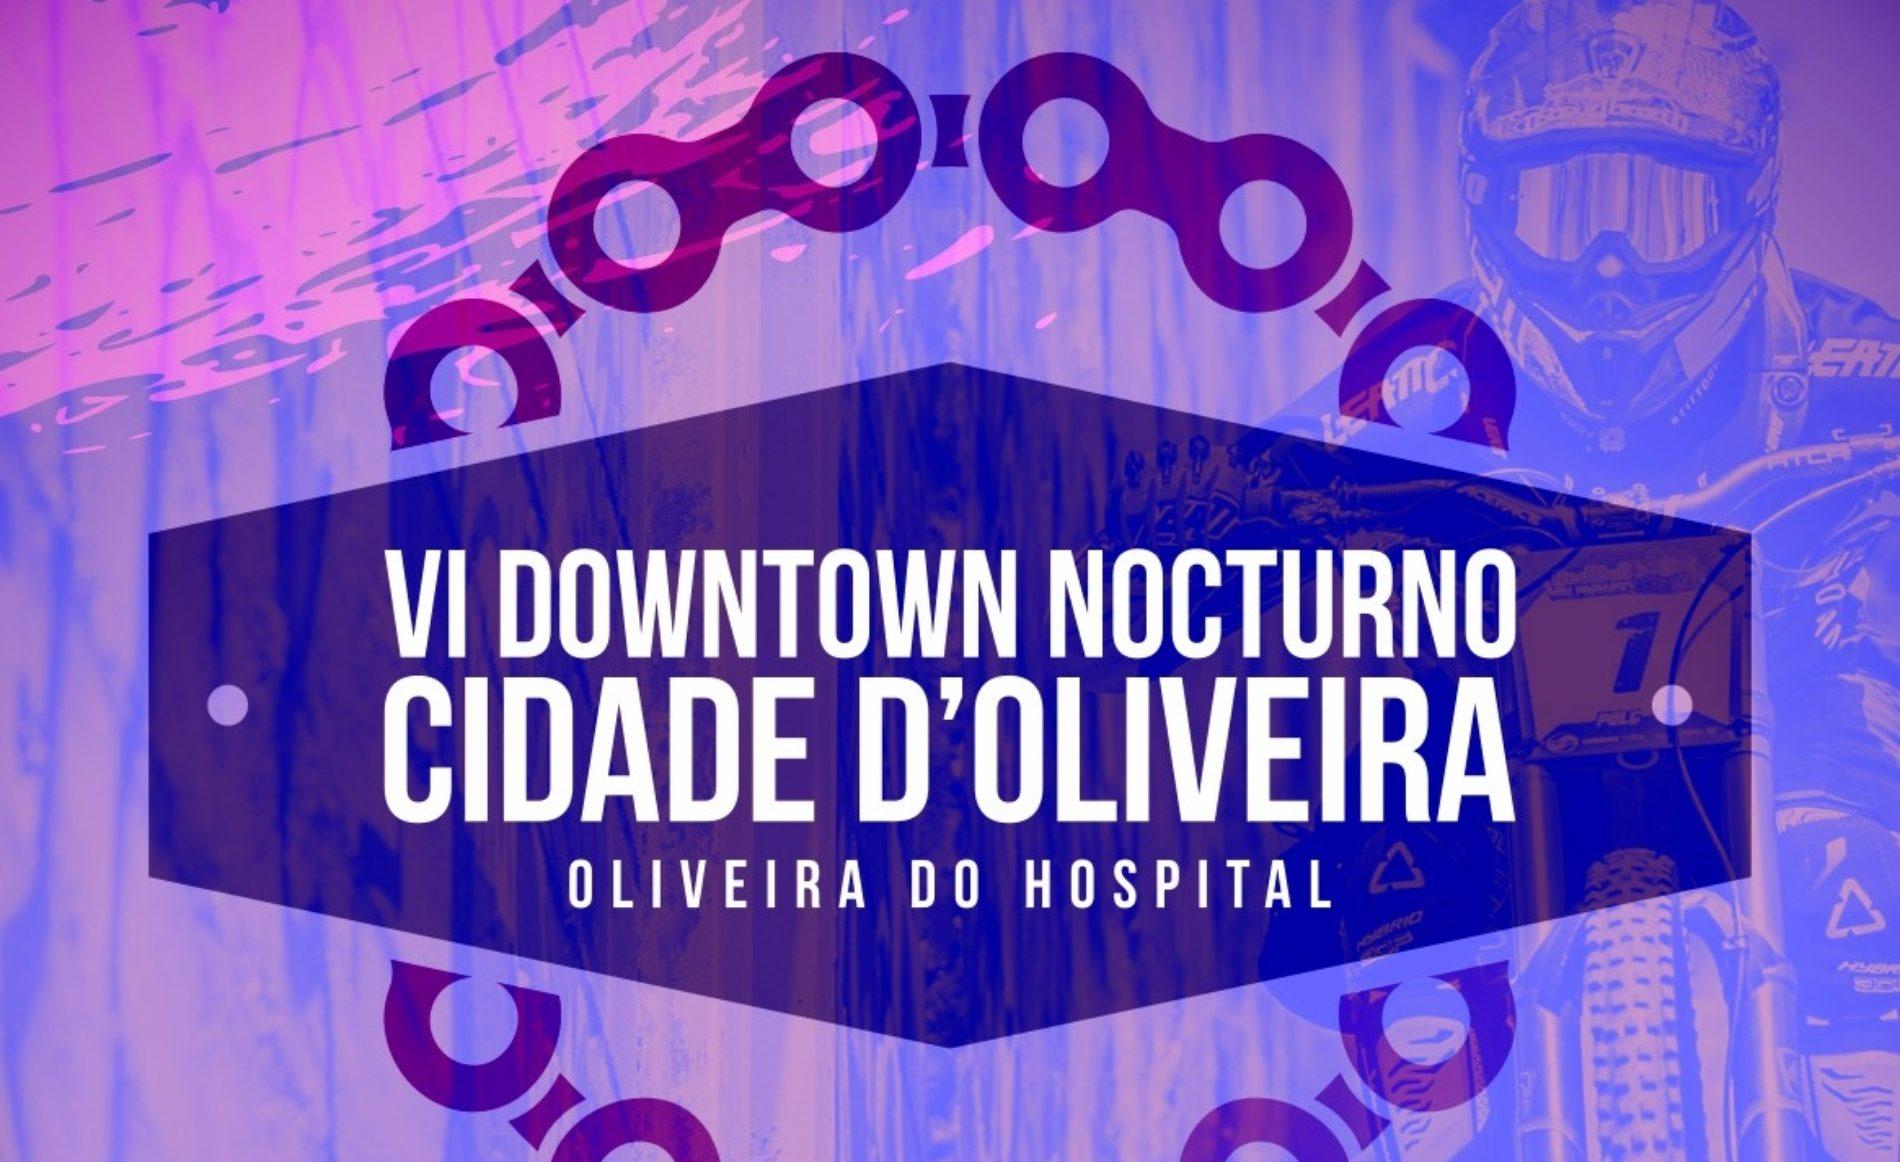 VI Downtown Nocturno Cidade D'Oliveira realiza-se no sábado